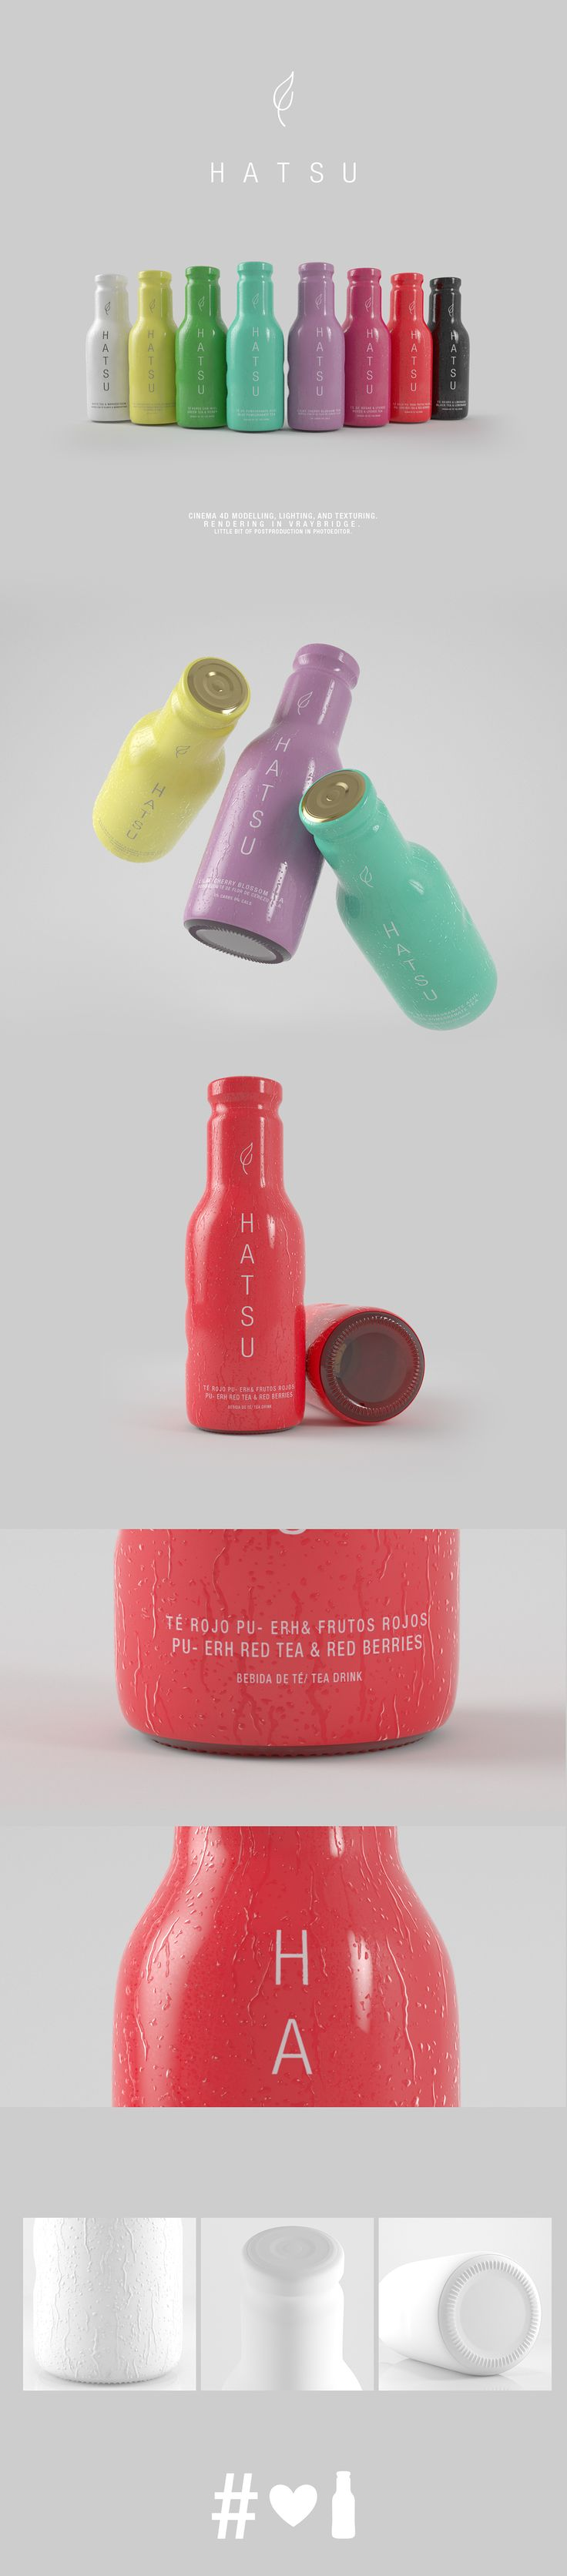 Té Hatsu - 3D MODEL on Behance